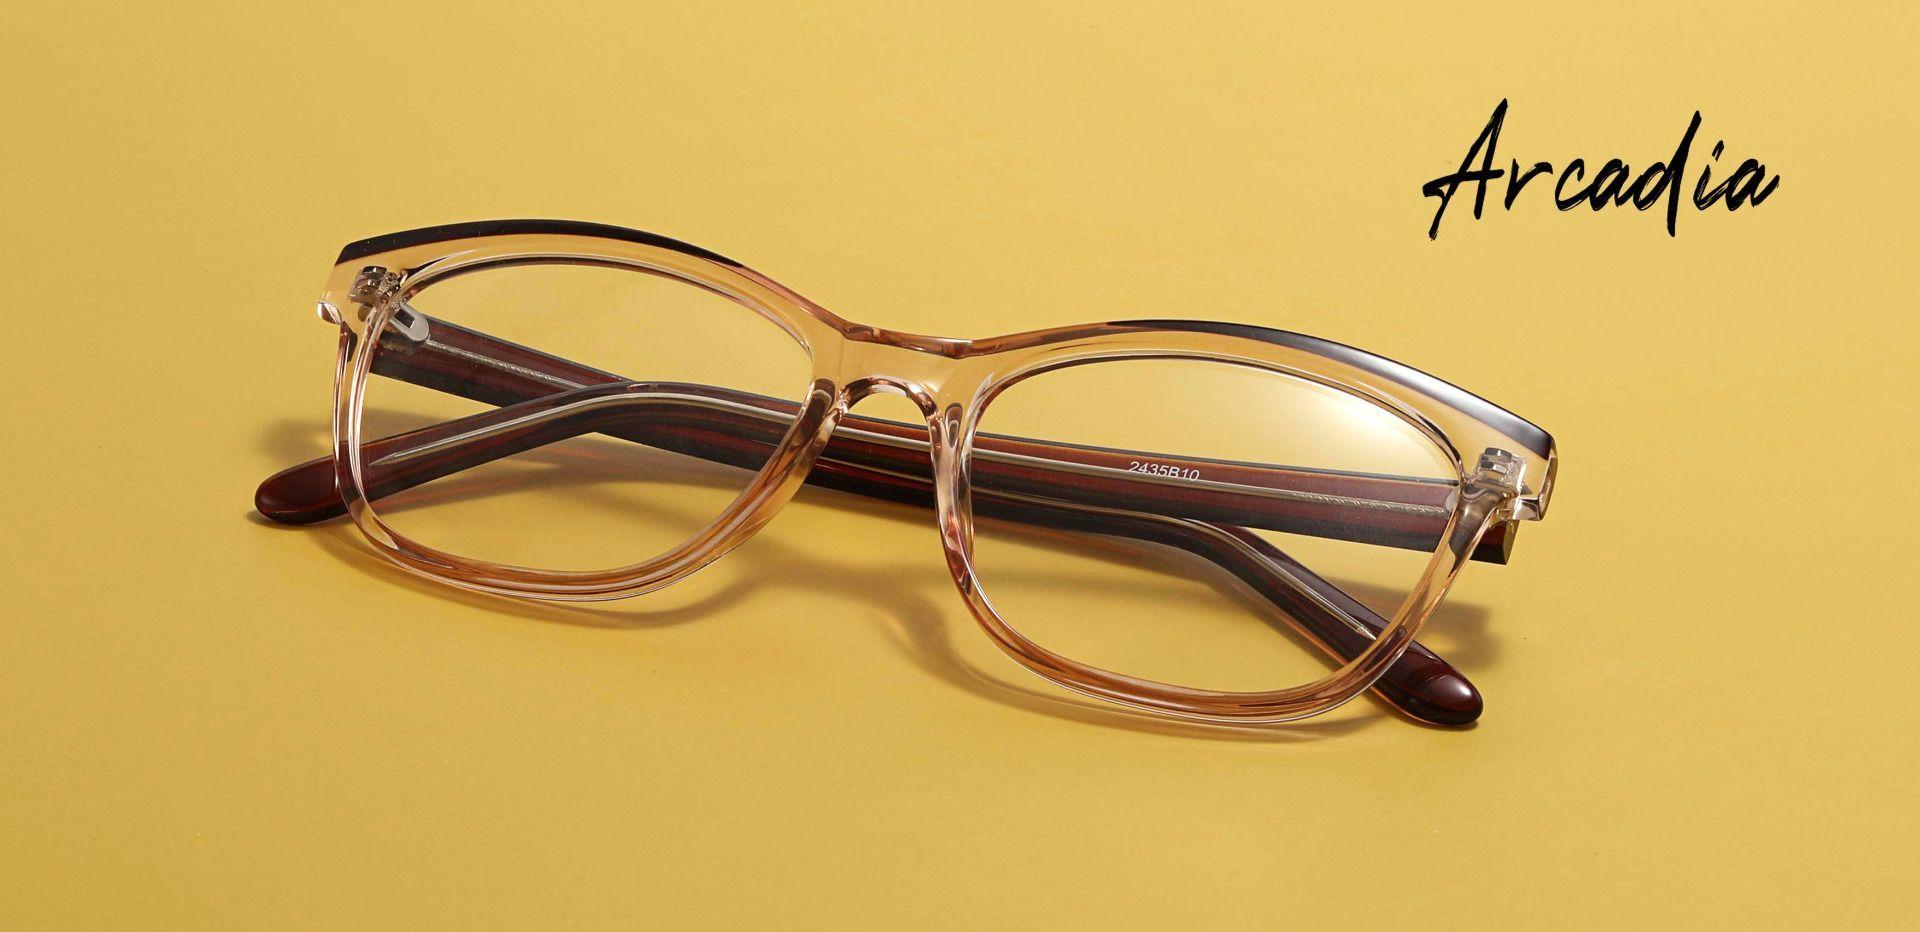 Arcadia Cat Eye Prescription Glasses - Brown